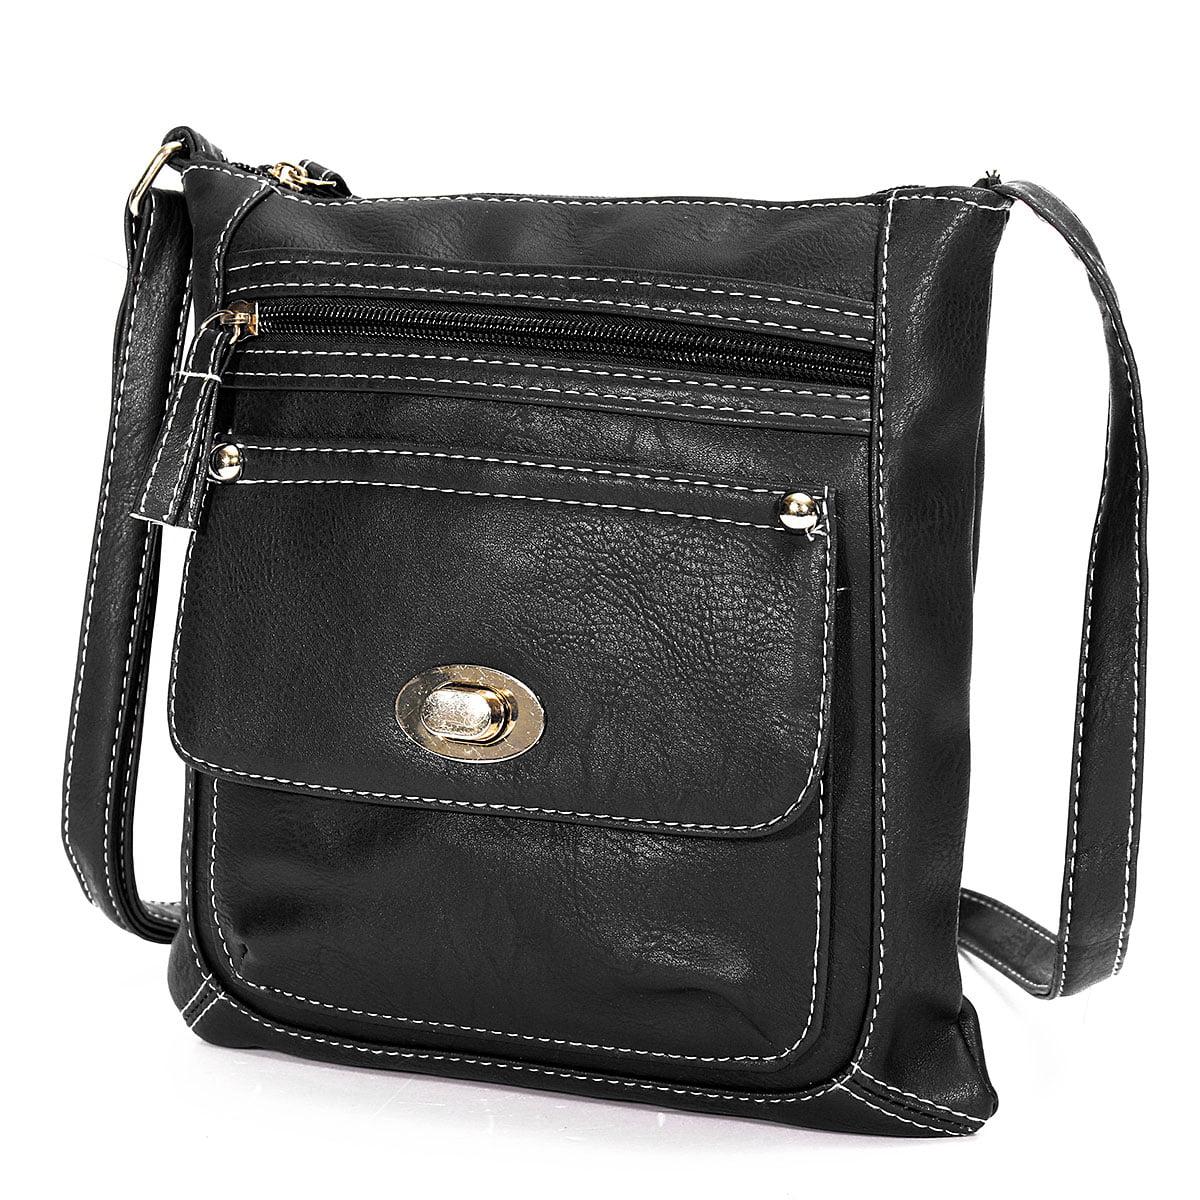 8bd6ea08ae Meigar - Fashion Shoulder Bag Handbag Crossbody Messenger PU Leather Small  Zipper For Women - Walmart.com